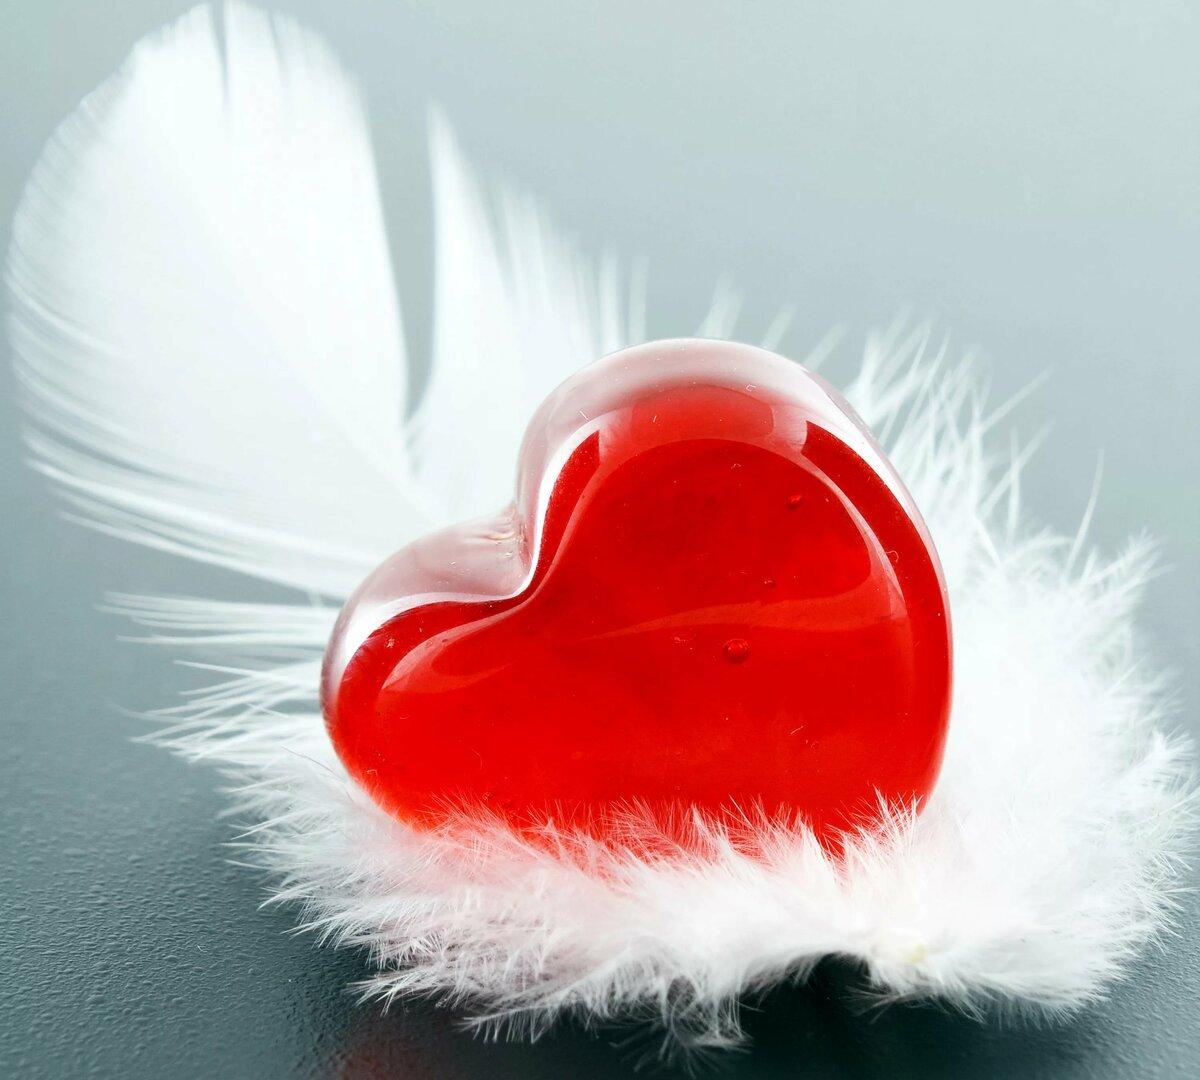 Картинки красивых сердец для любимого